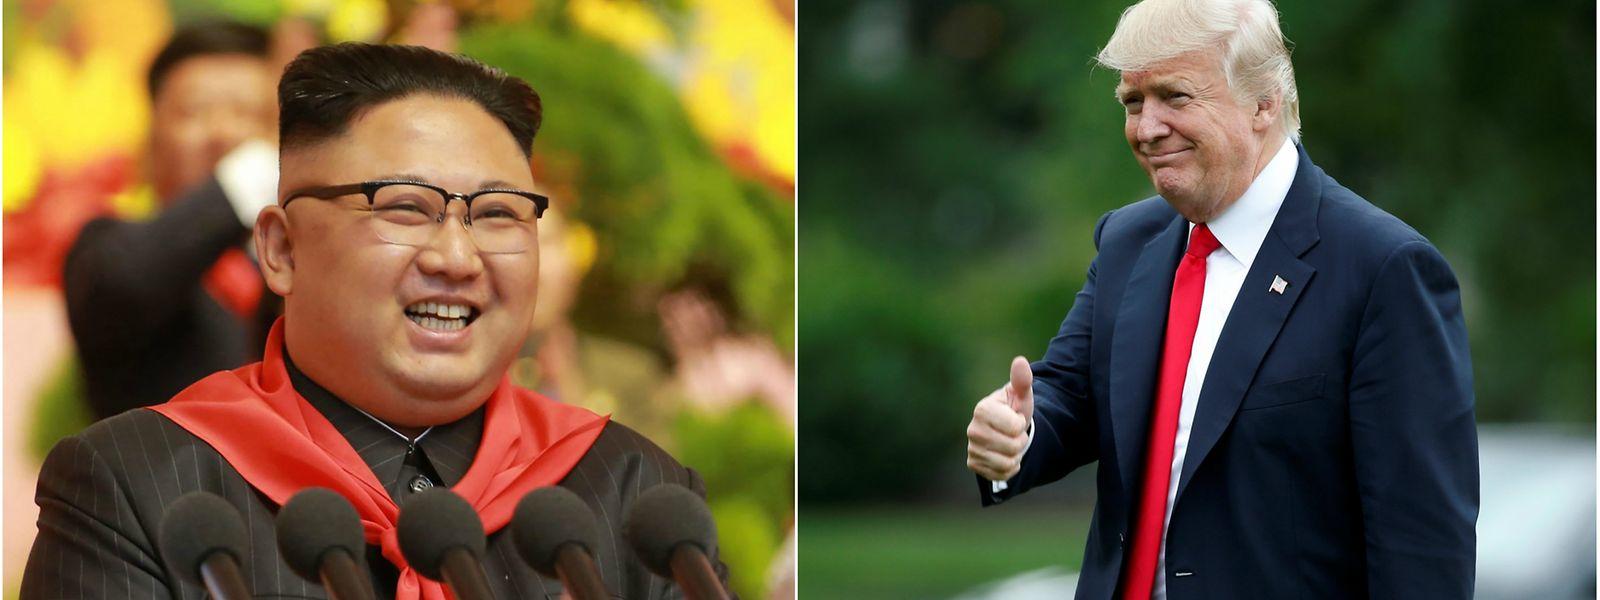 A cimeira entre Trump e Kim será a primeira da história entre líderes dos Estados Unidos e da Coreia do Norte